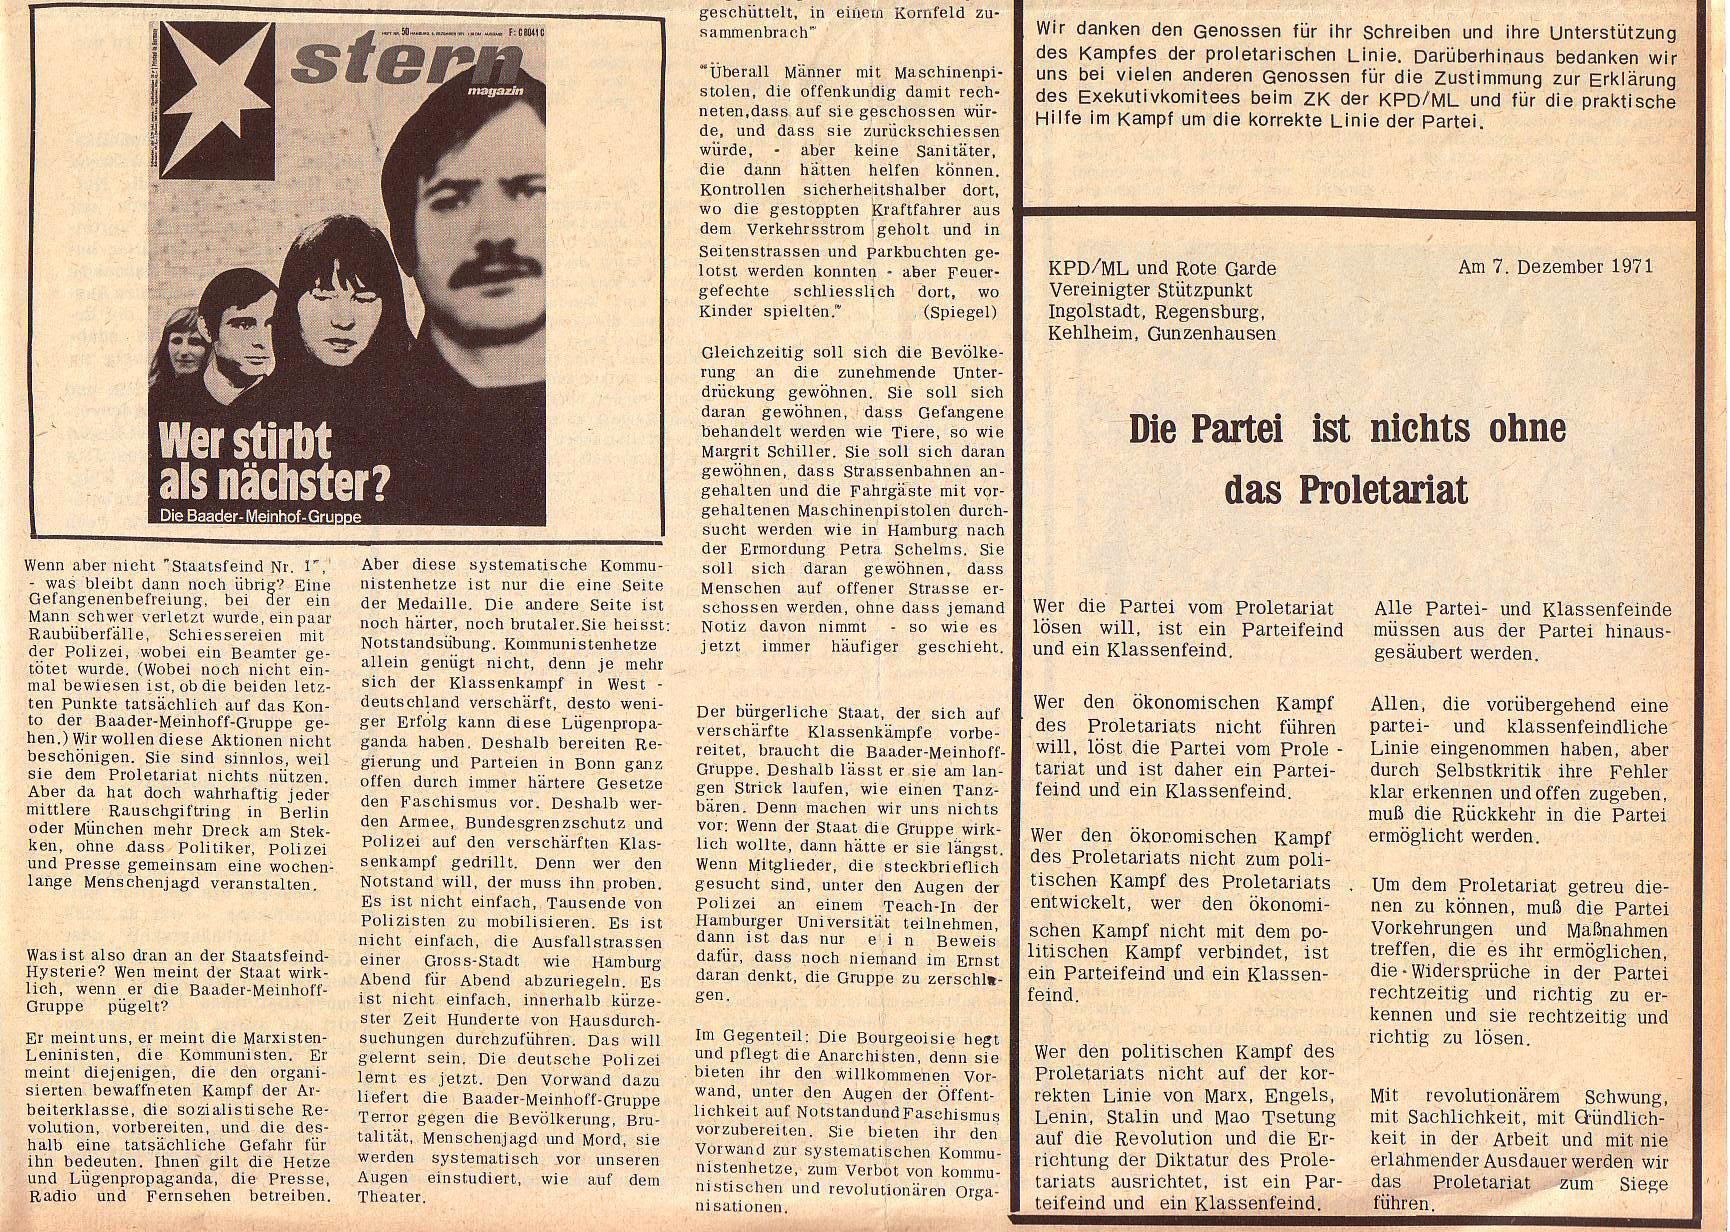 Roter Morgen, 5. Jg., 27. Dezember 1971, Nr. 16, Seite 3b